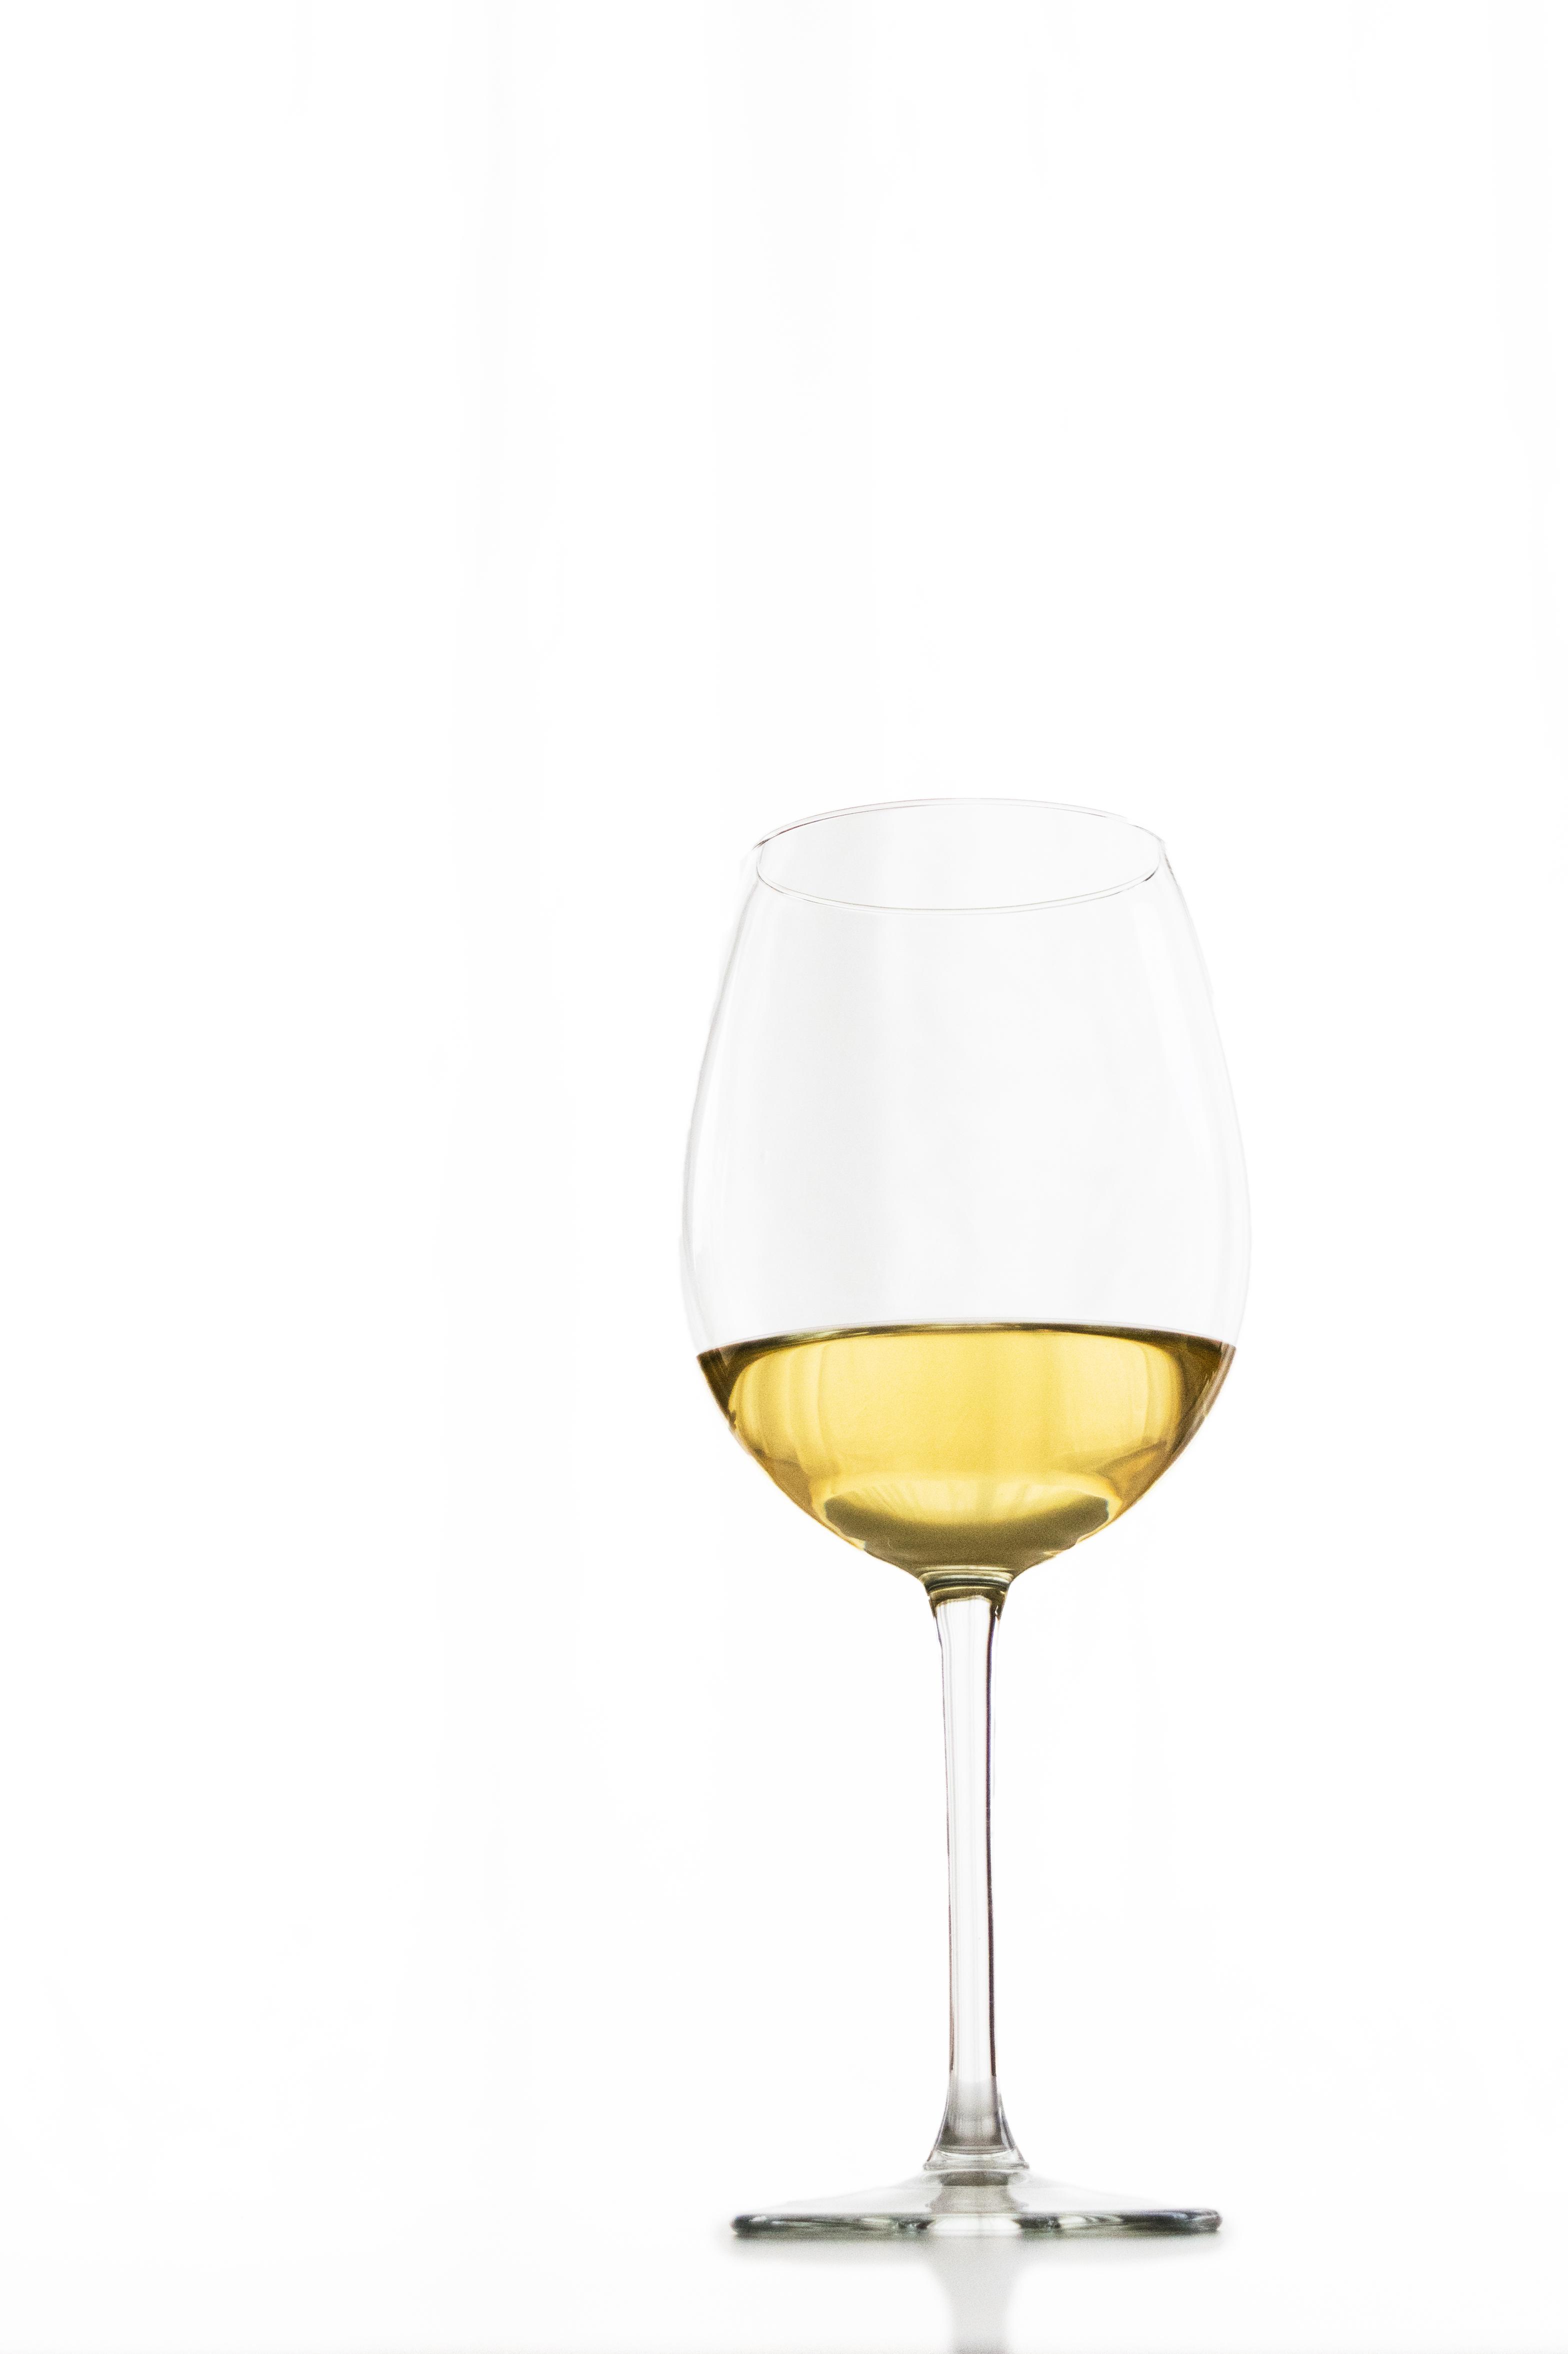 Kraško belo vino